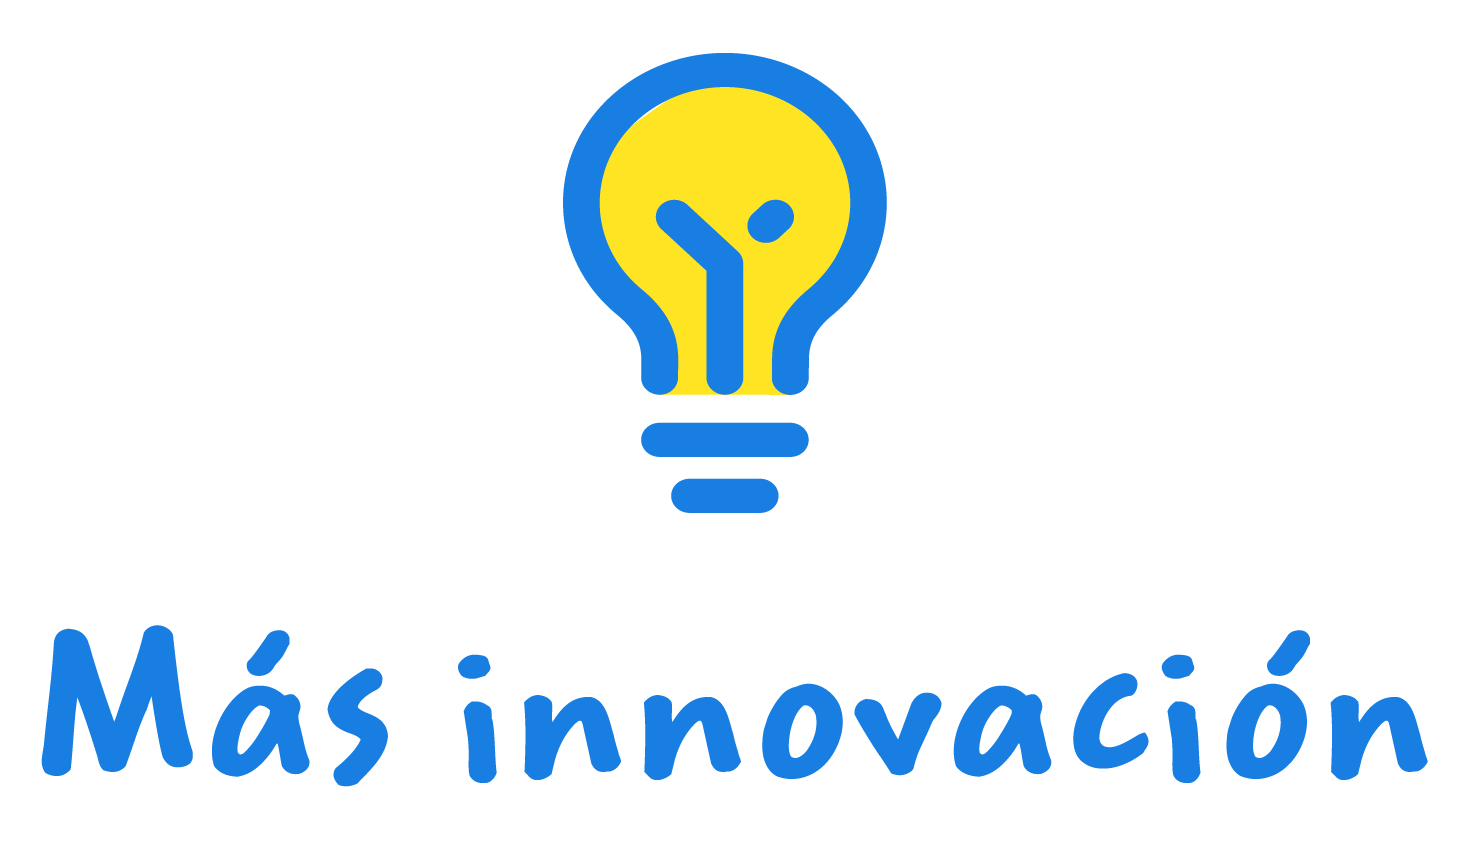 mas innovacion